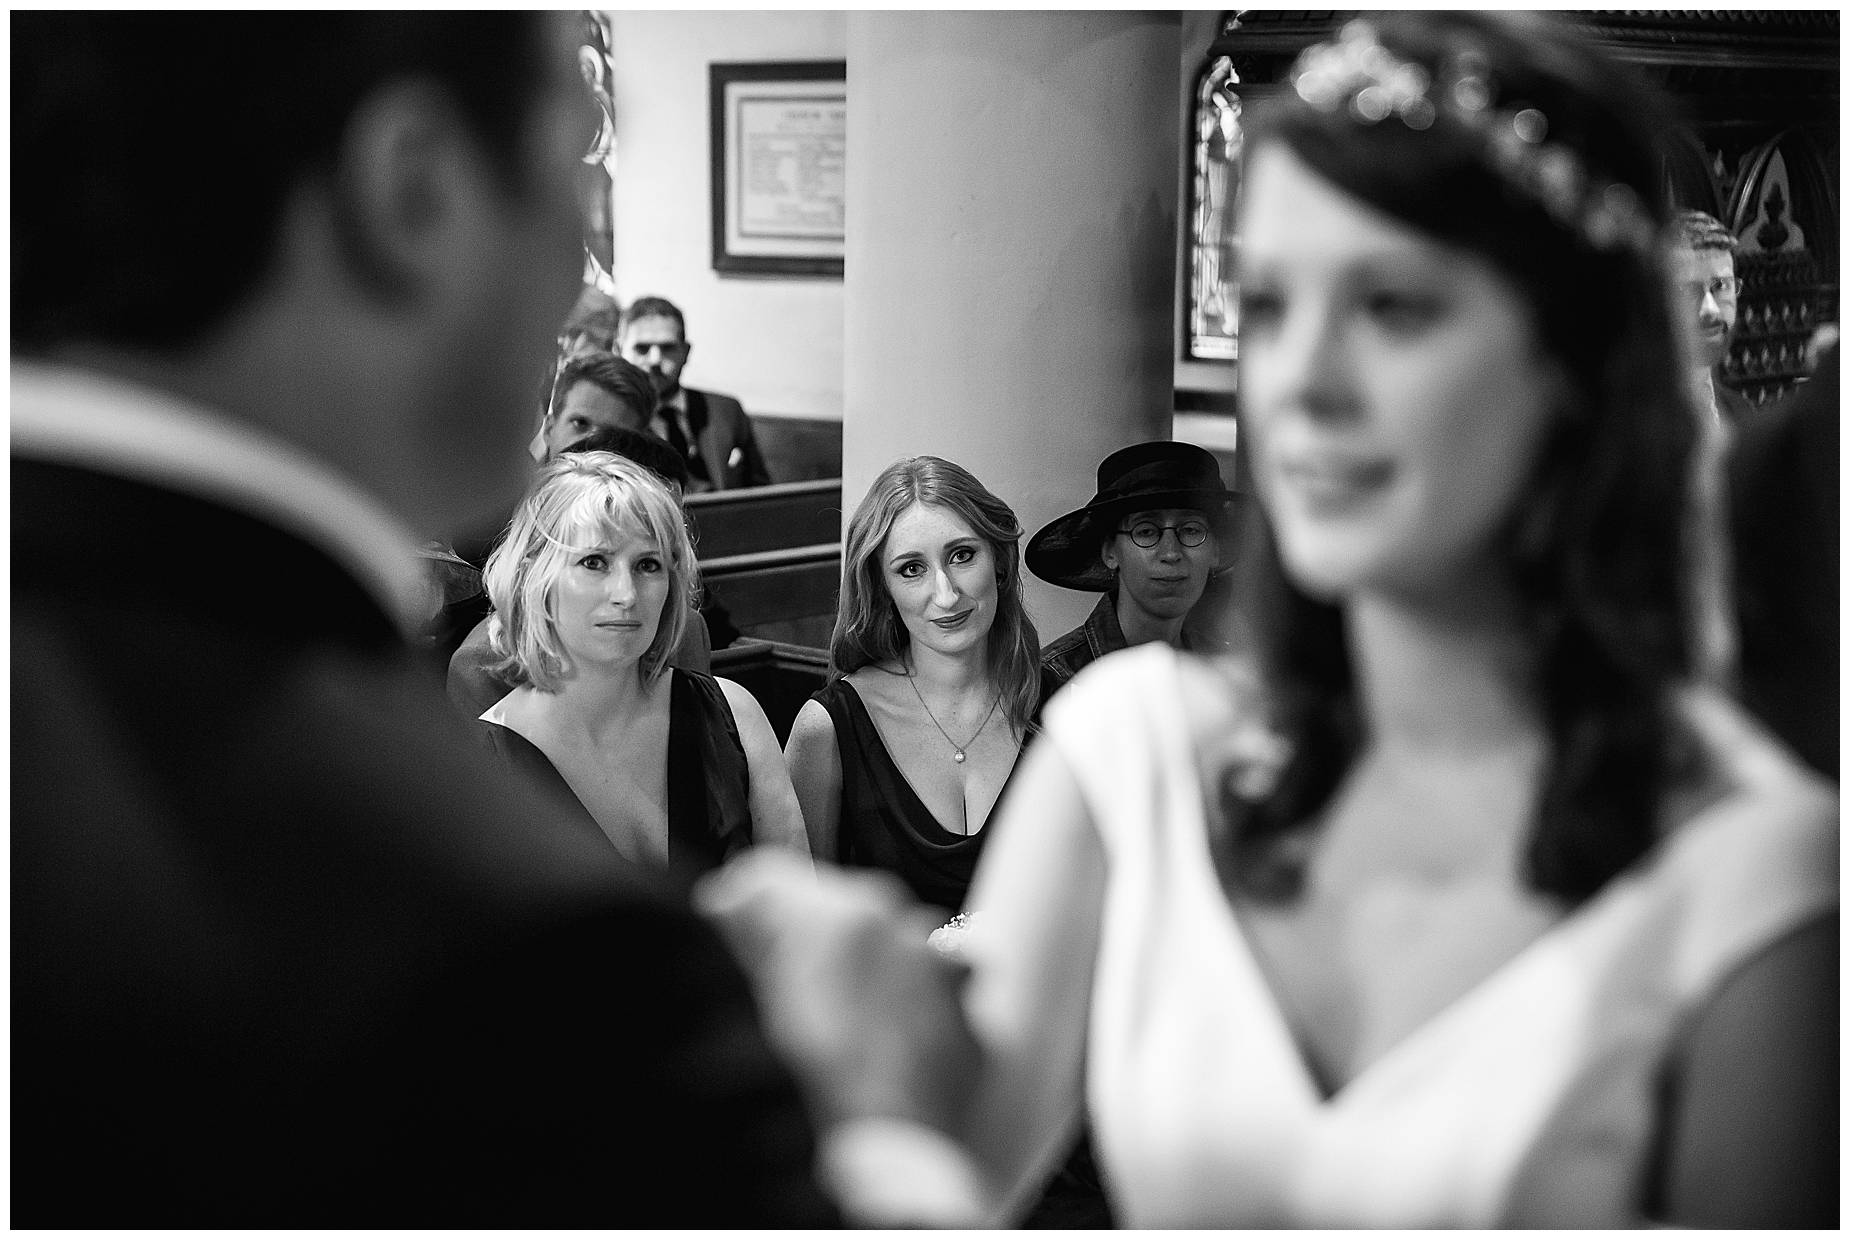 bridesmaids look at bride getting married